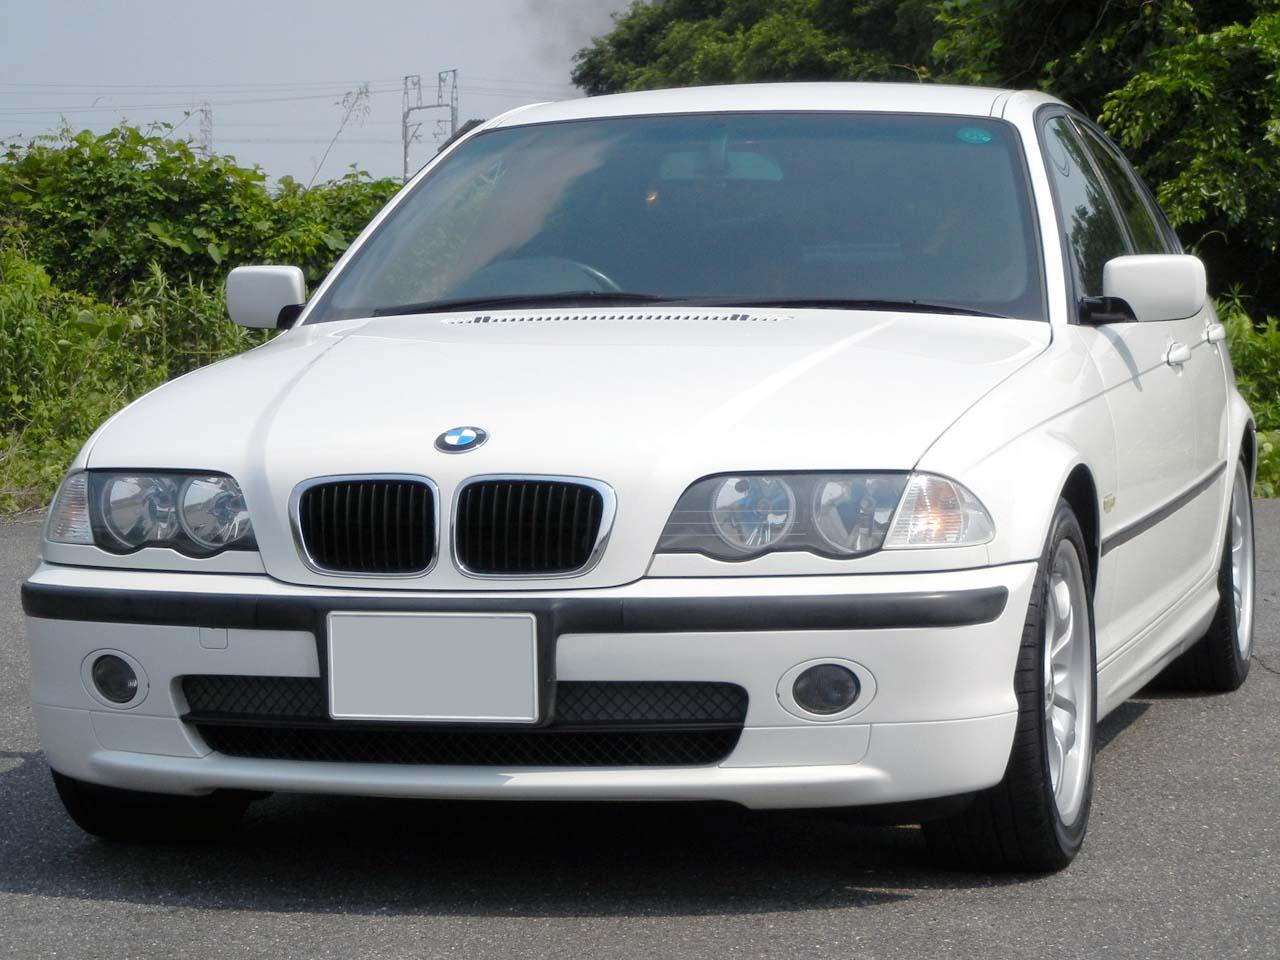 BMW・3シリーズの画像 p1_38